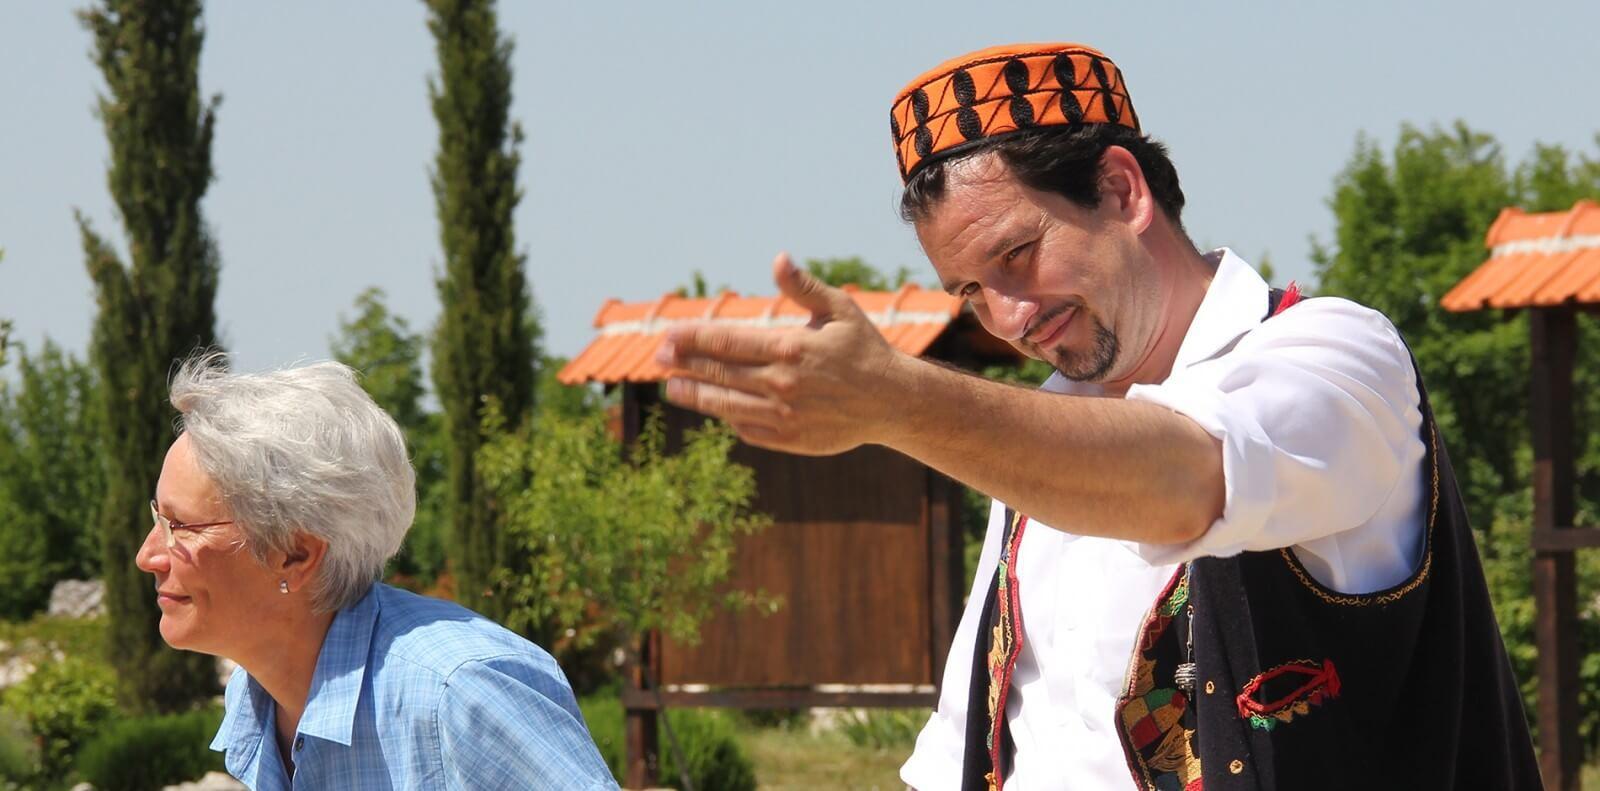 Sibenik hat - the symbol of Sibenik and Dalmatia